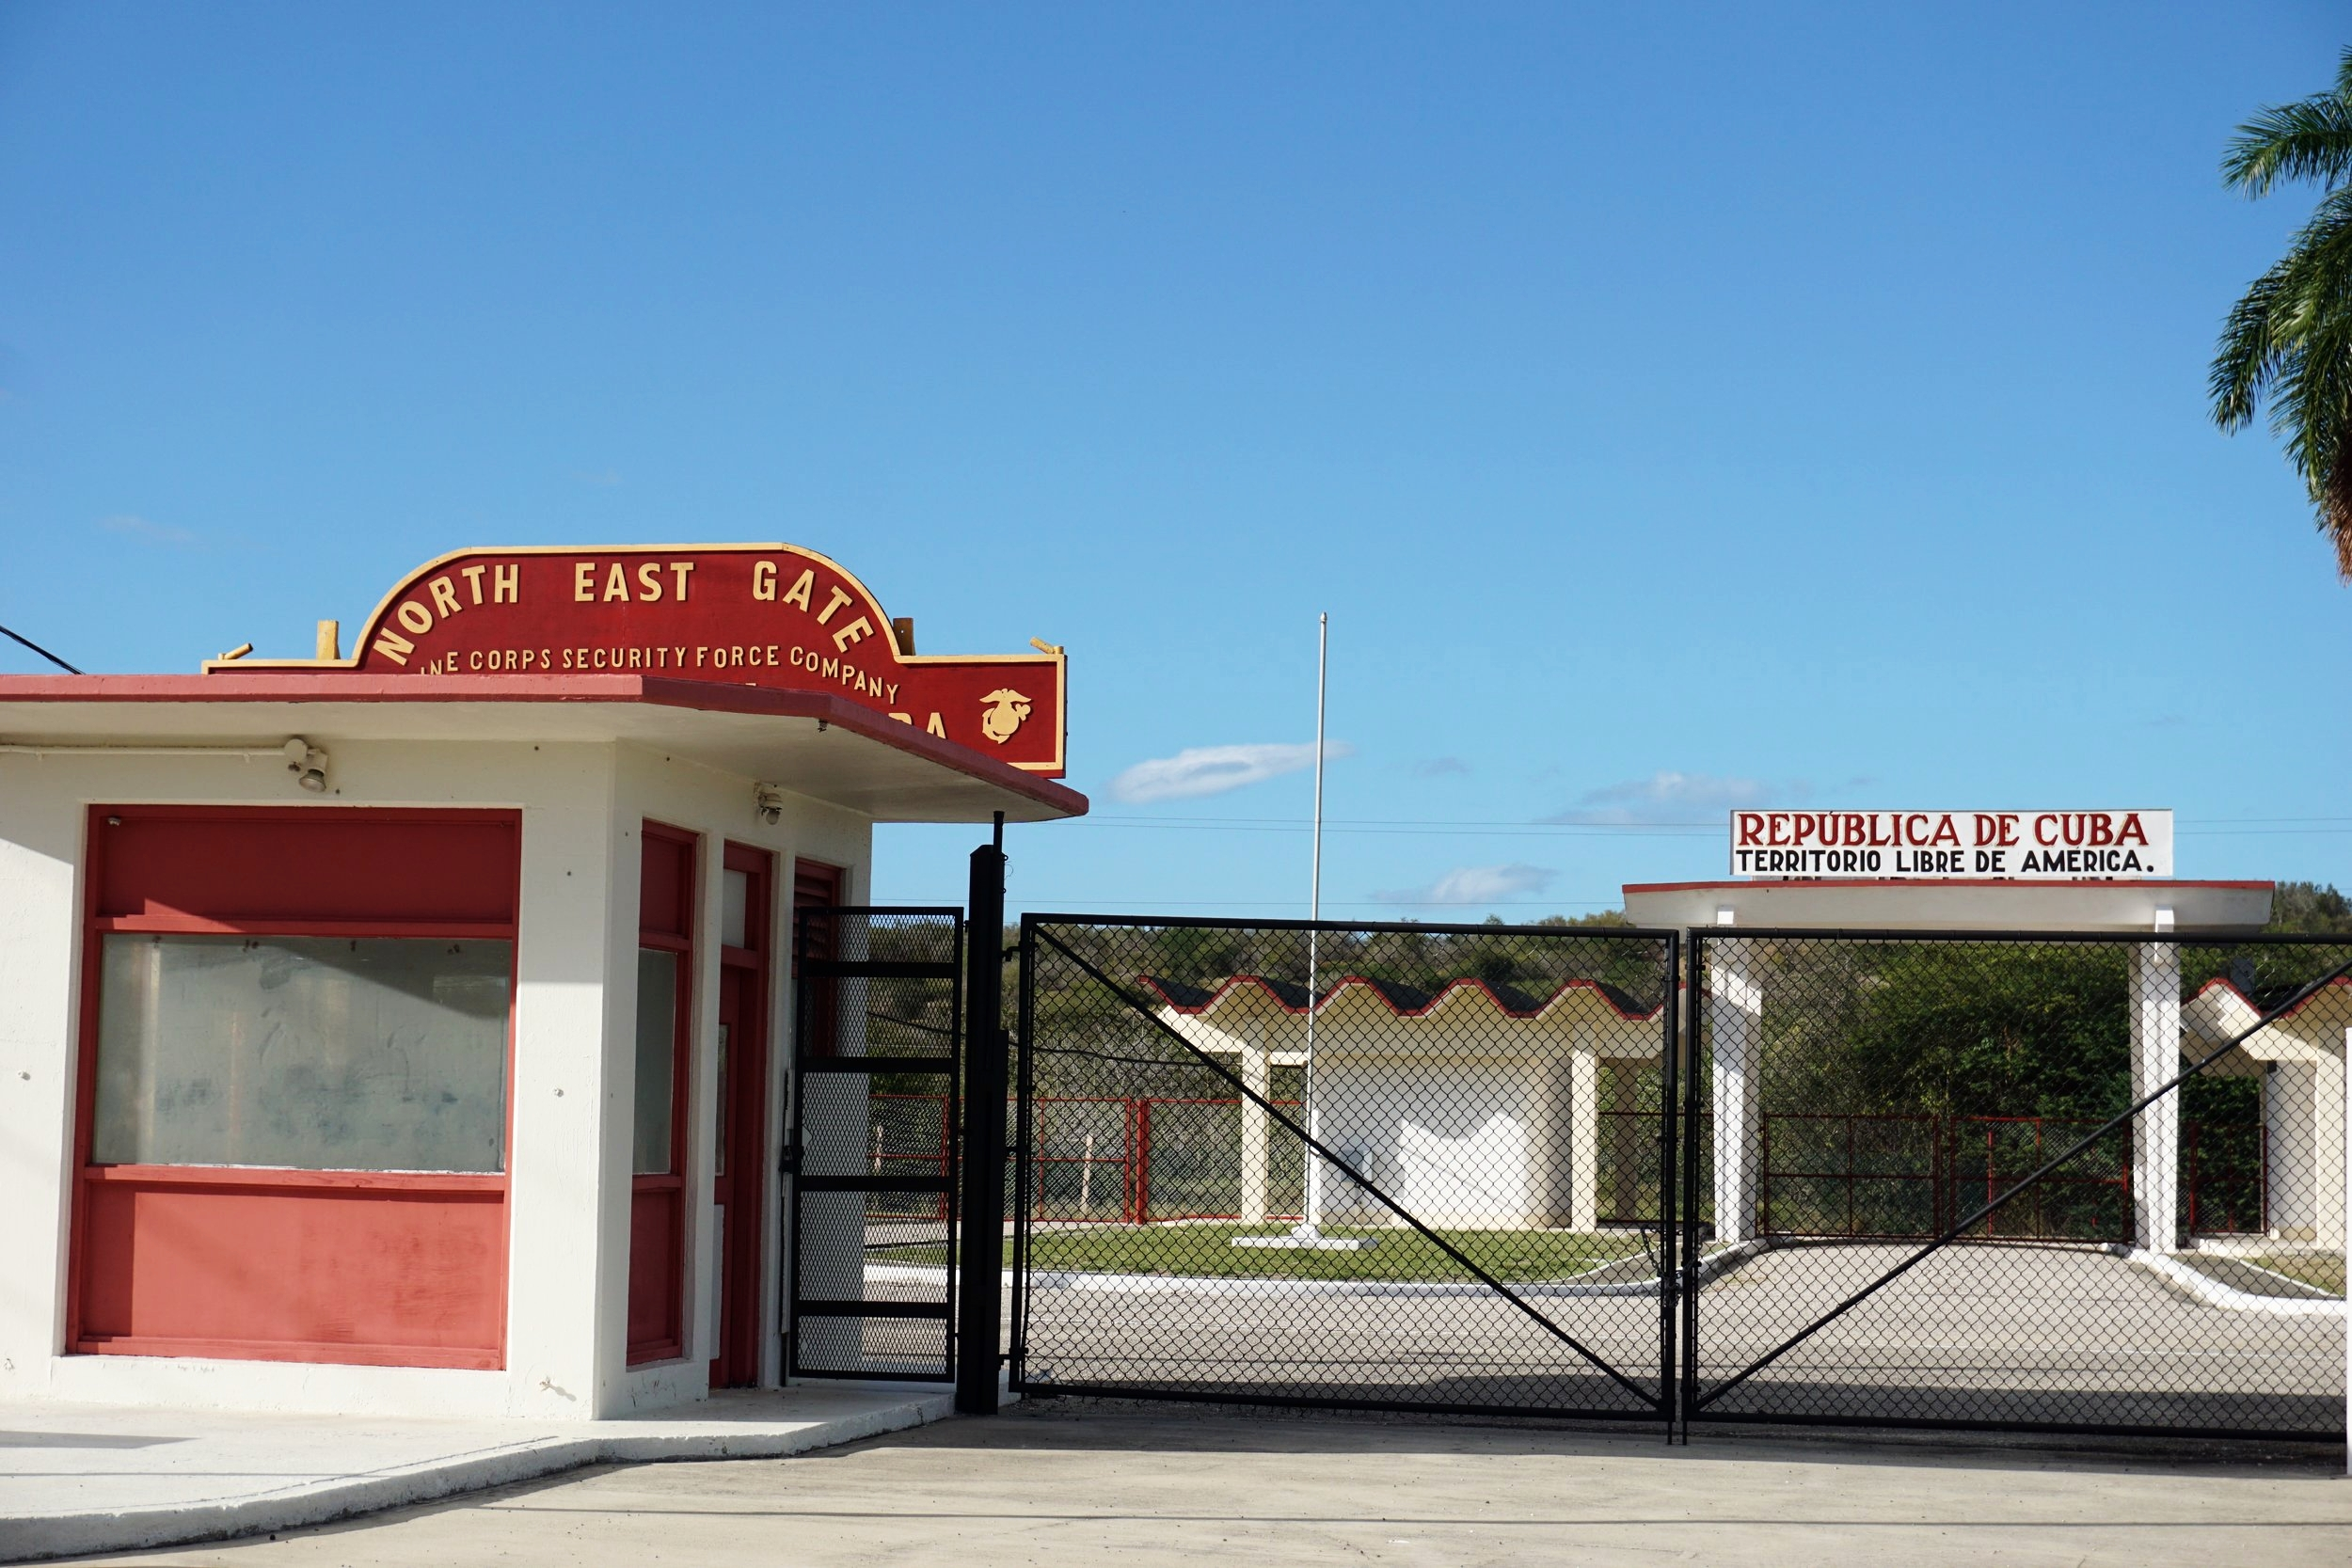 The border between Cuba and U.S territory